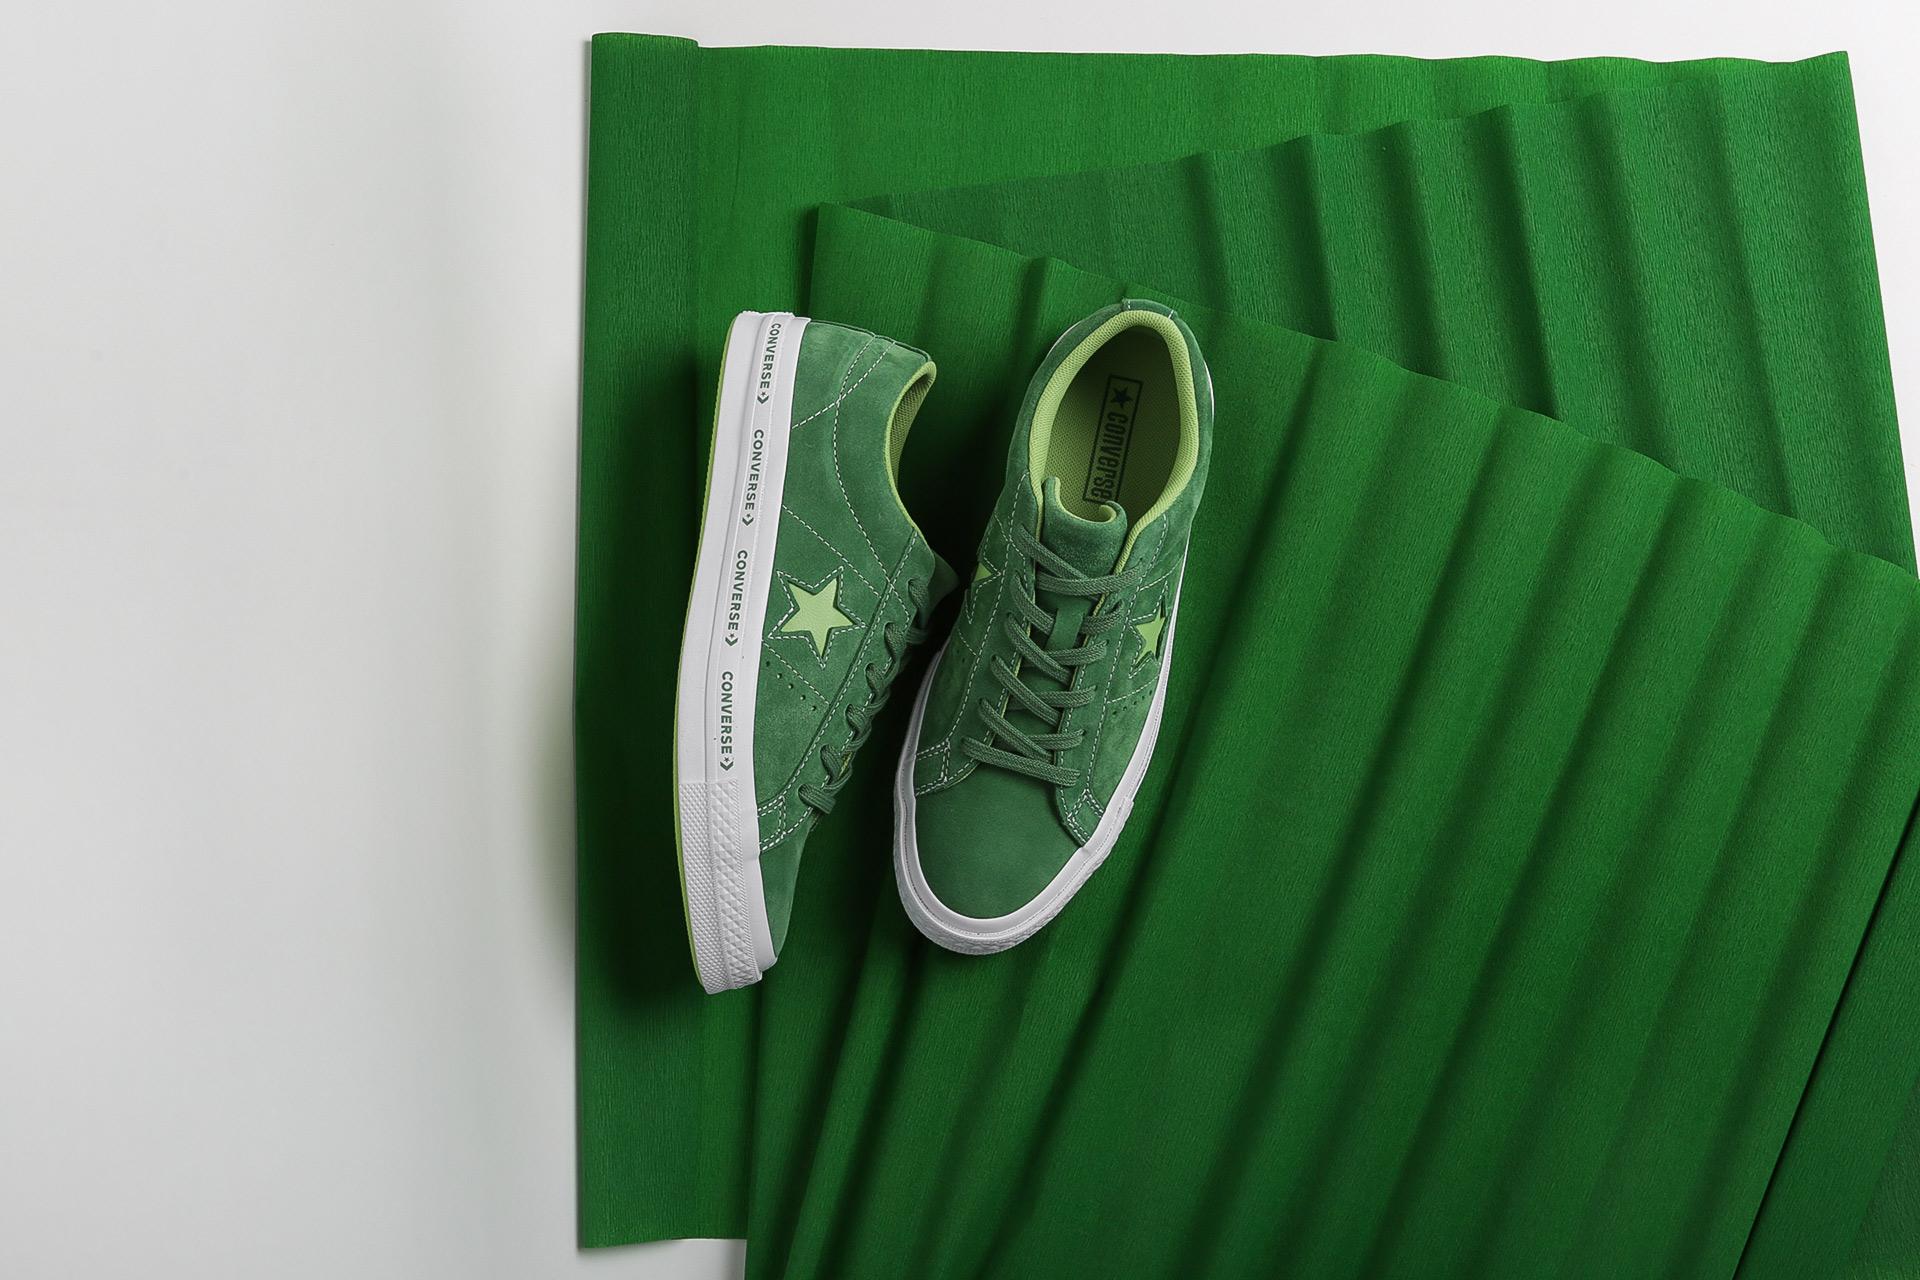 fae86e69a6c7 Купить зеленые кроссовки One Star OX от Converse (159816) по цене ...